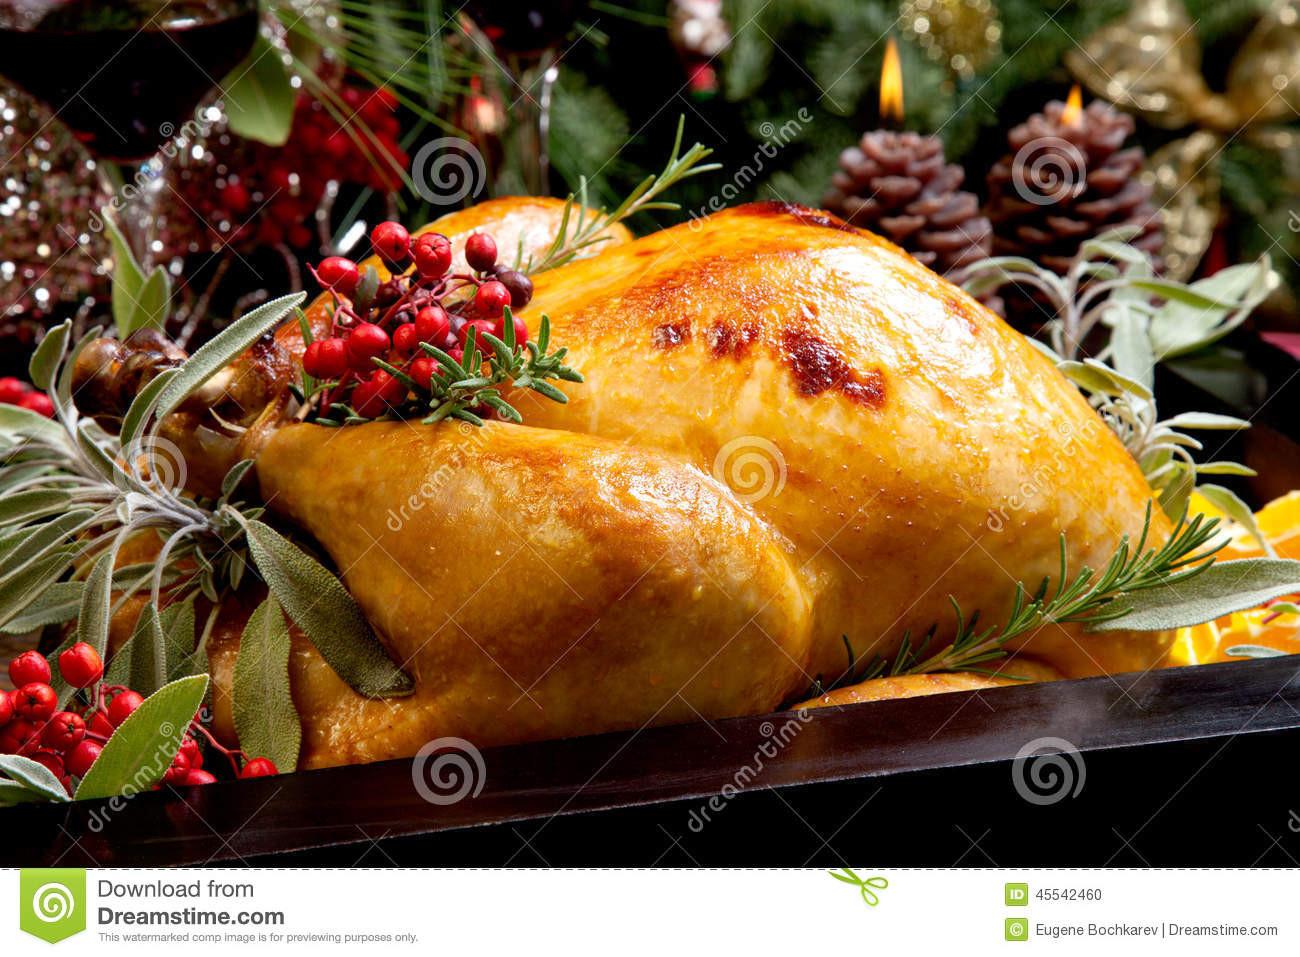 Prepared Thanksgiving Turkey  Christmas Turkey Prepared For Dinner Stock Image